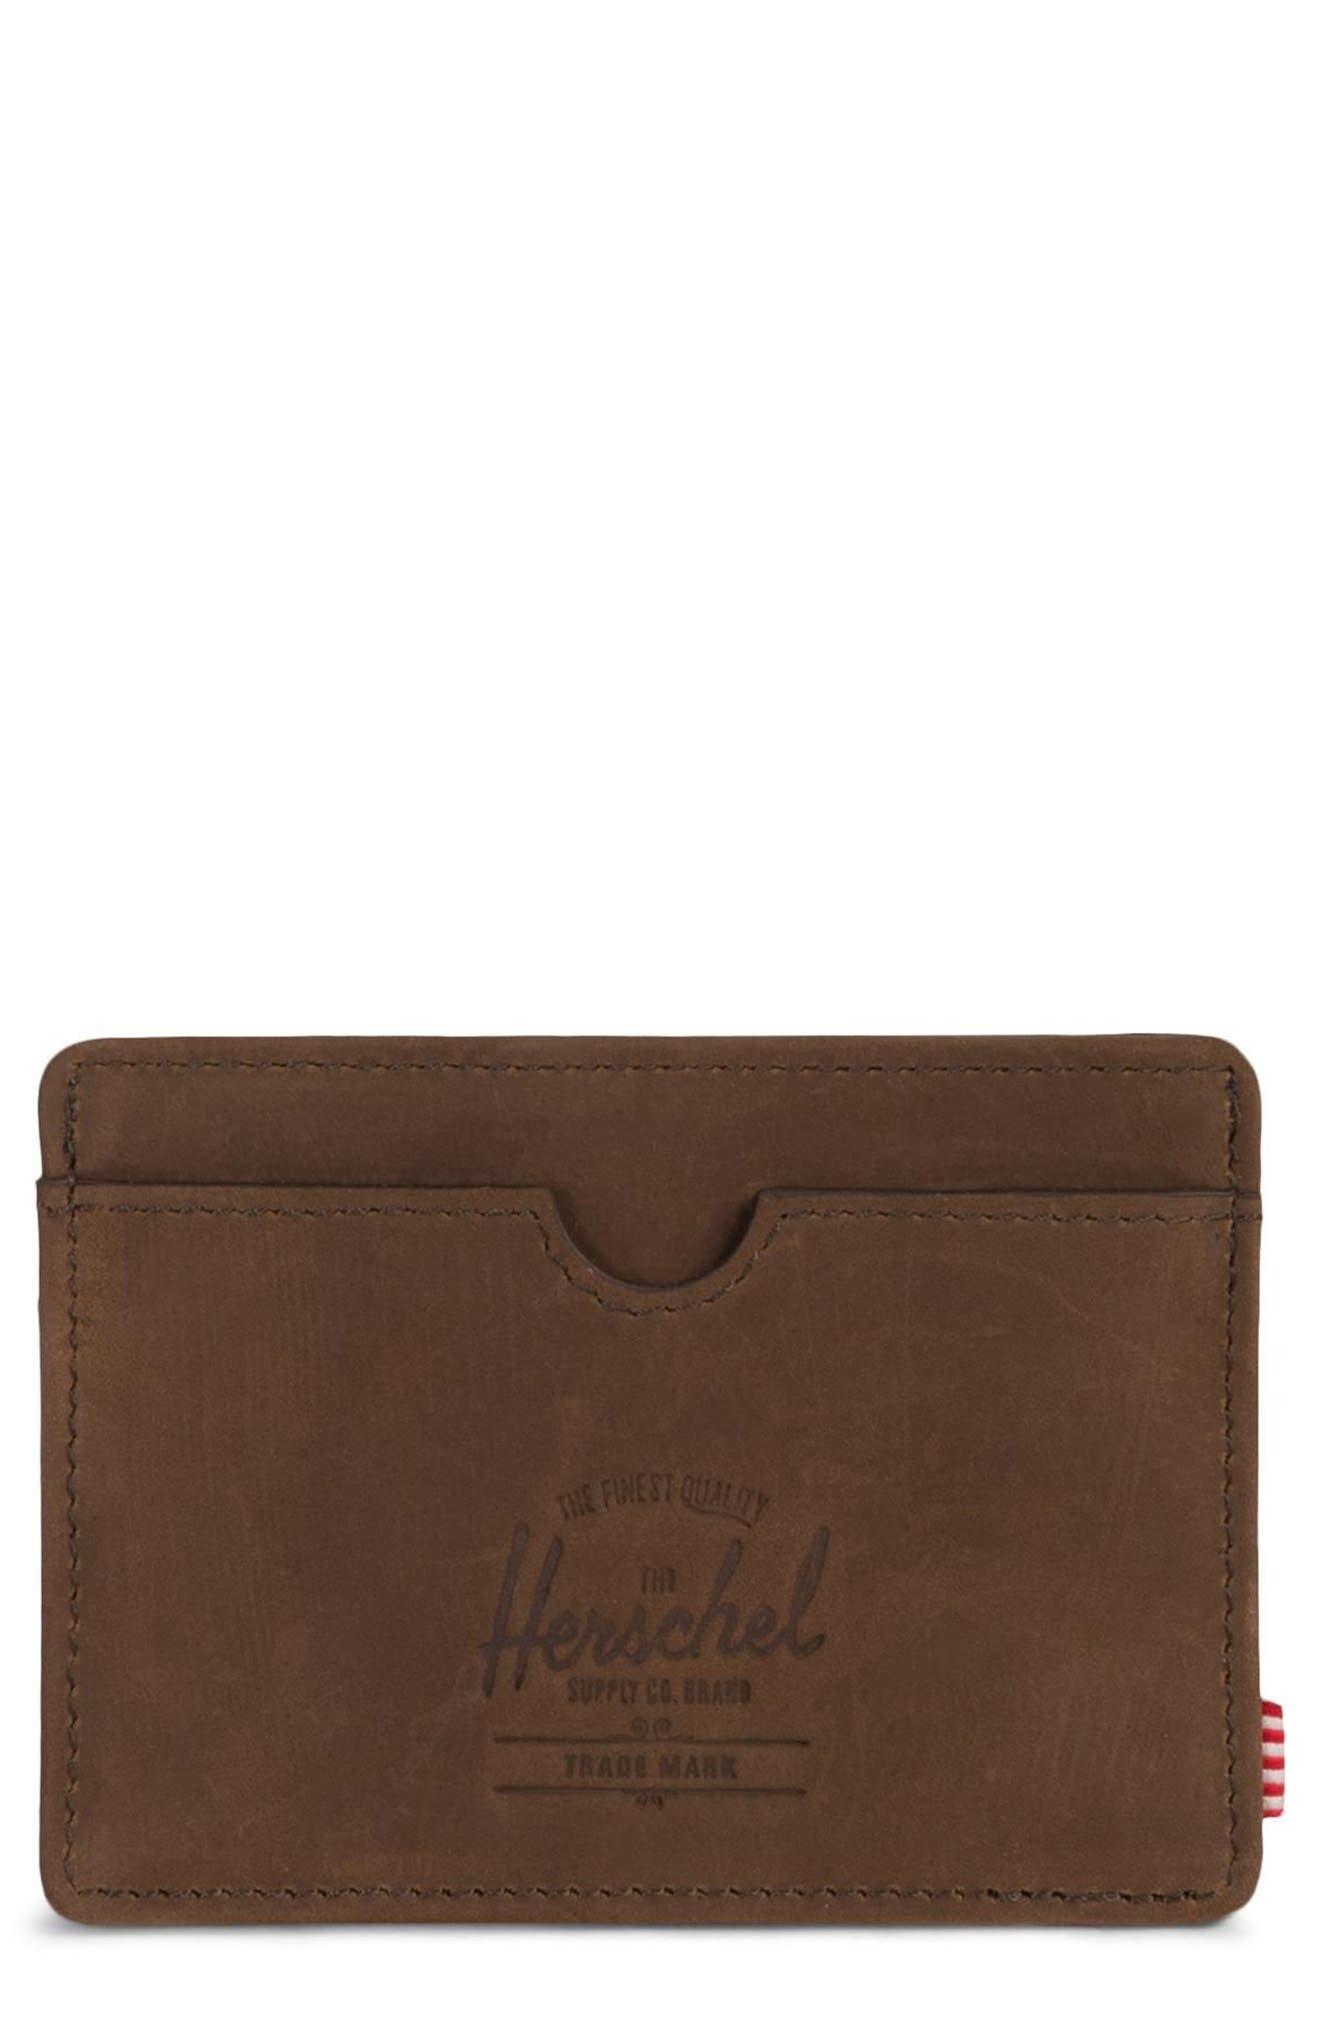 HERSCHEL SUPPLY CO. Charlie Nubuck Leather Card Case, Main, color, NUBUCK BROWN